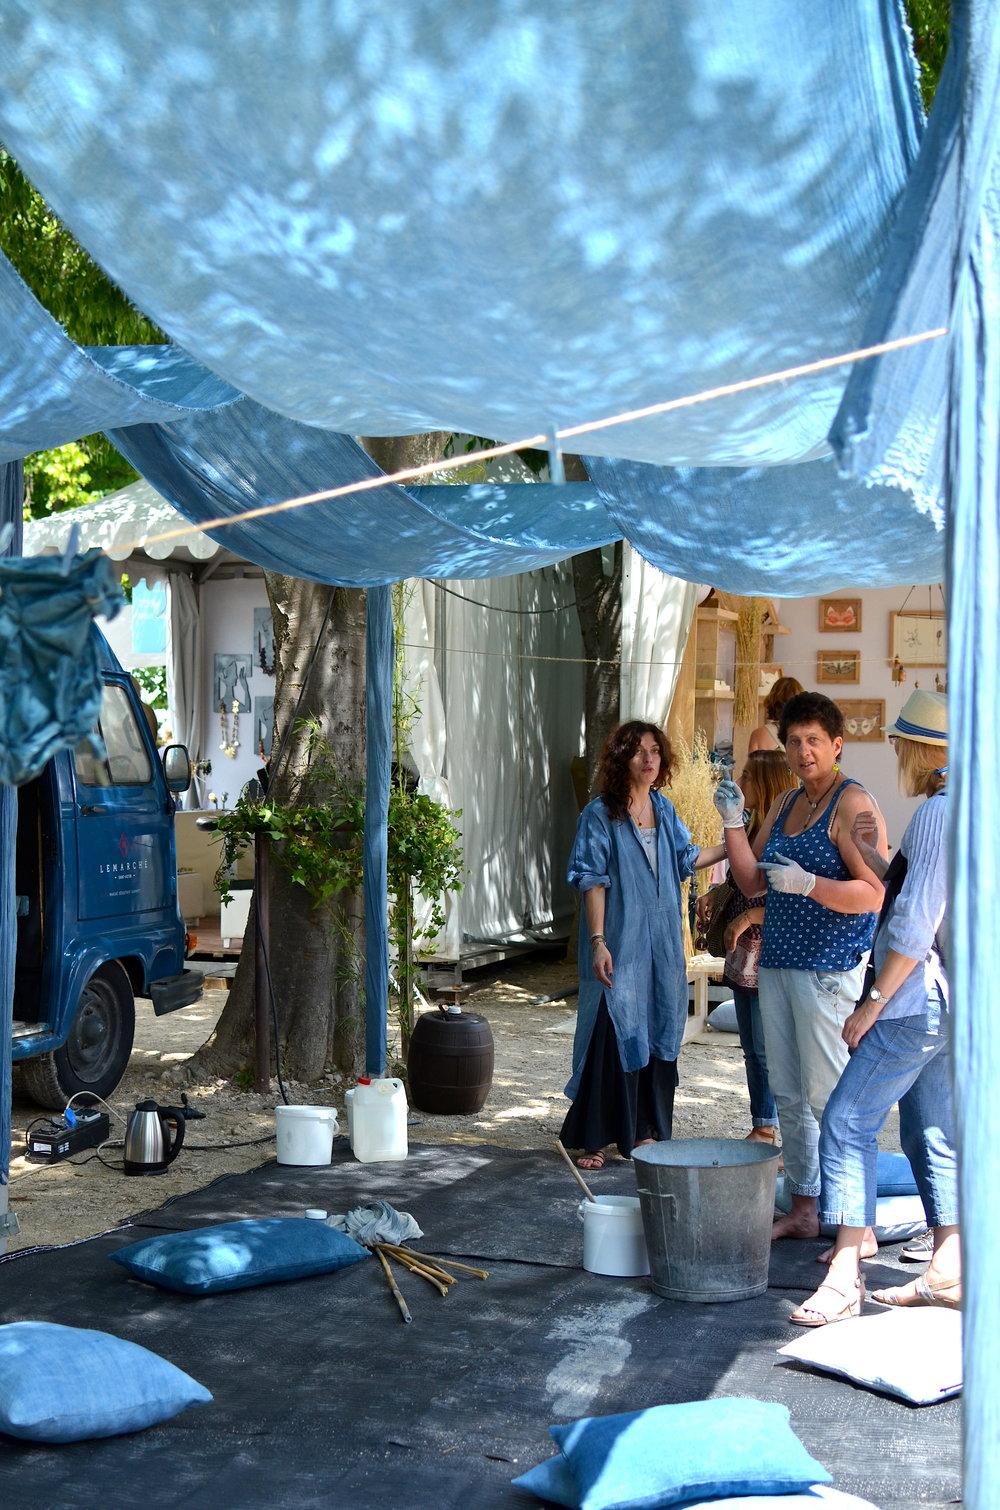 twinky lizzy blog aix en provence - cote sud 2017 10.jpg